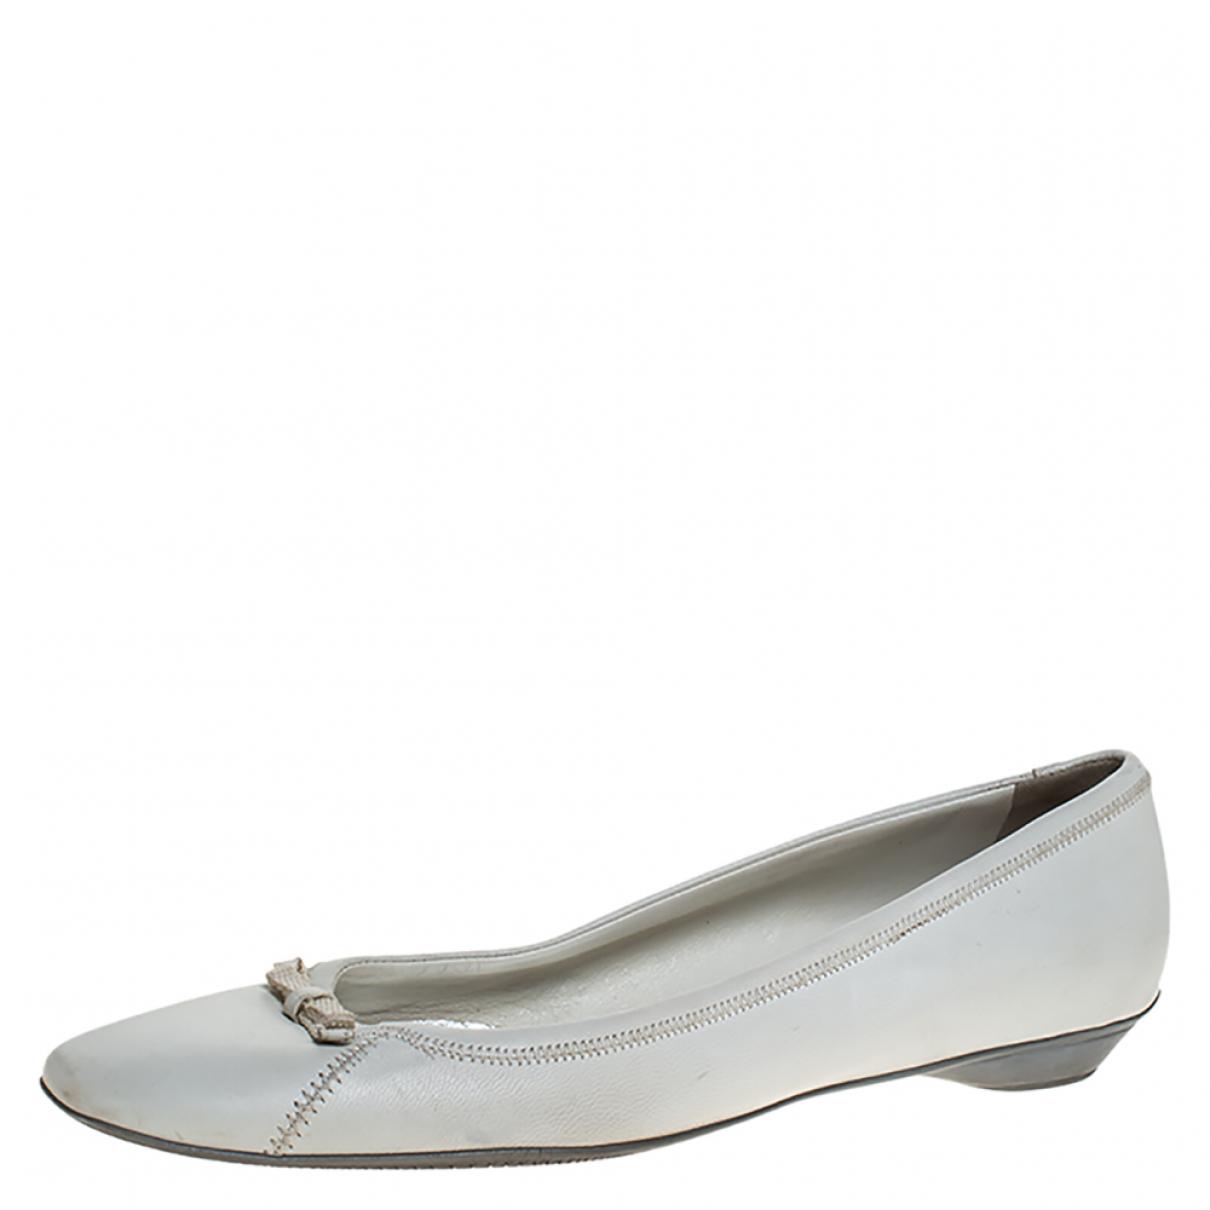 Prada \N White Leather Flats for Women 8.5 US